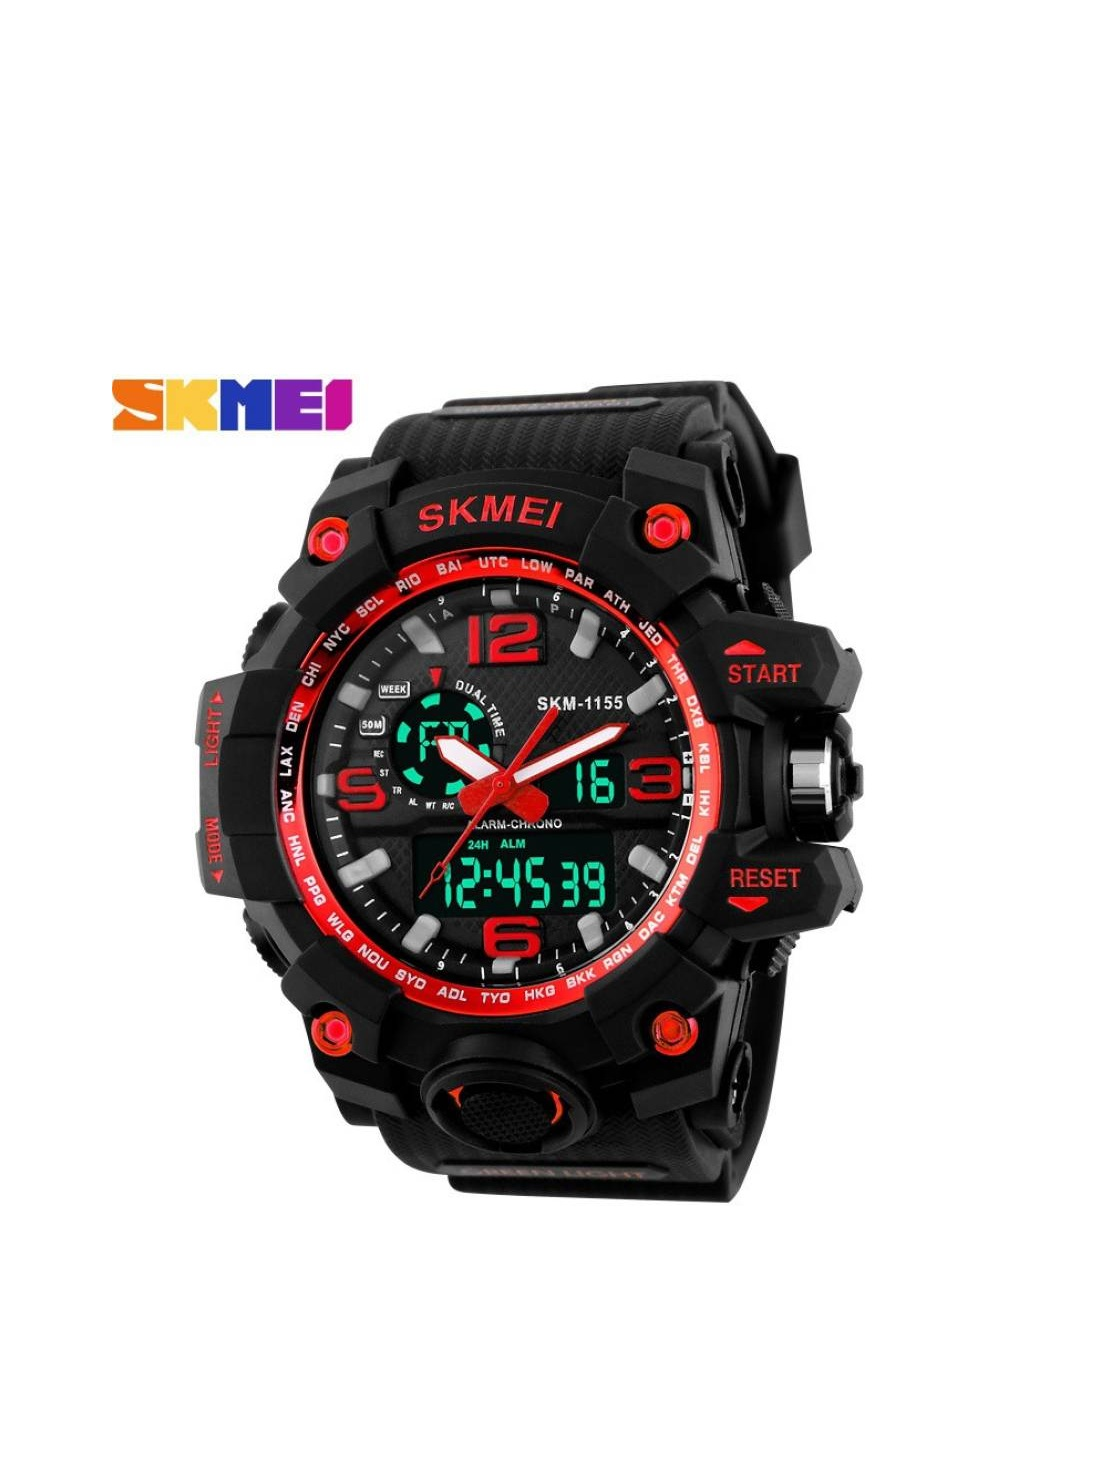 Skmei Skm 1155 Red Black Analog With Digital Best Looking Sport Watch For Men,Boys